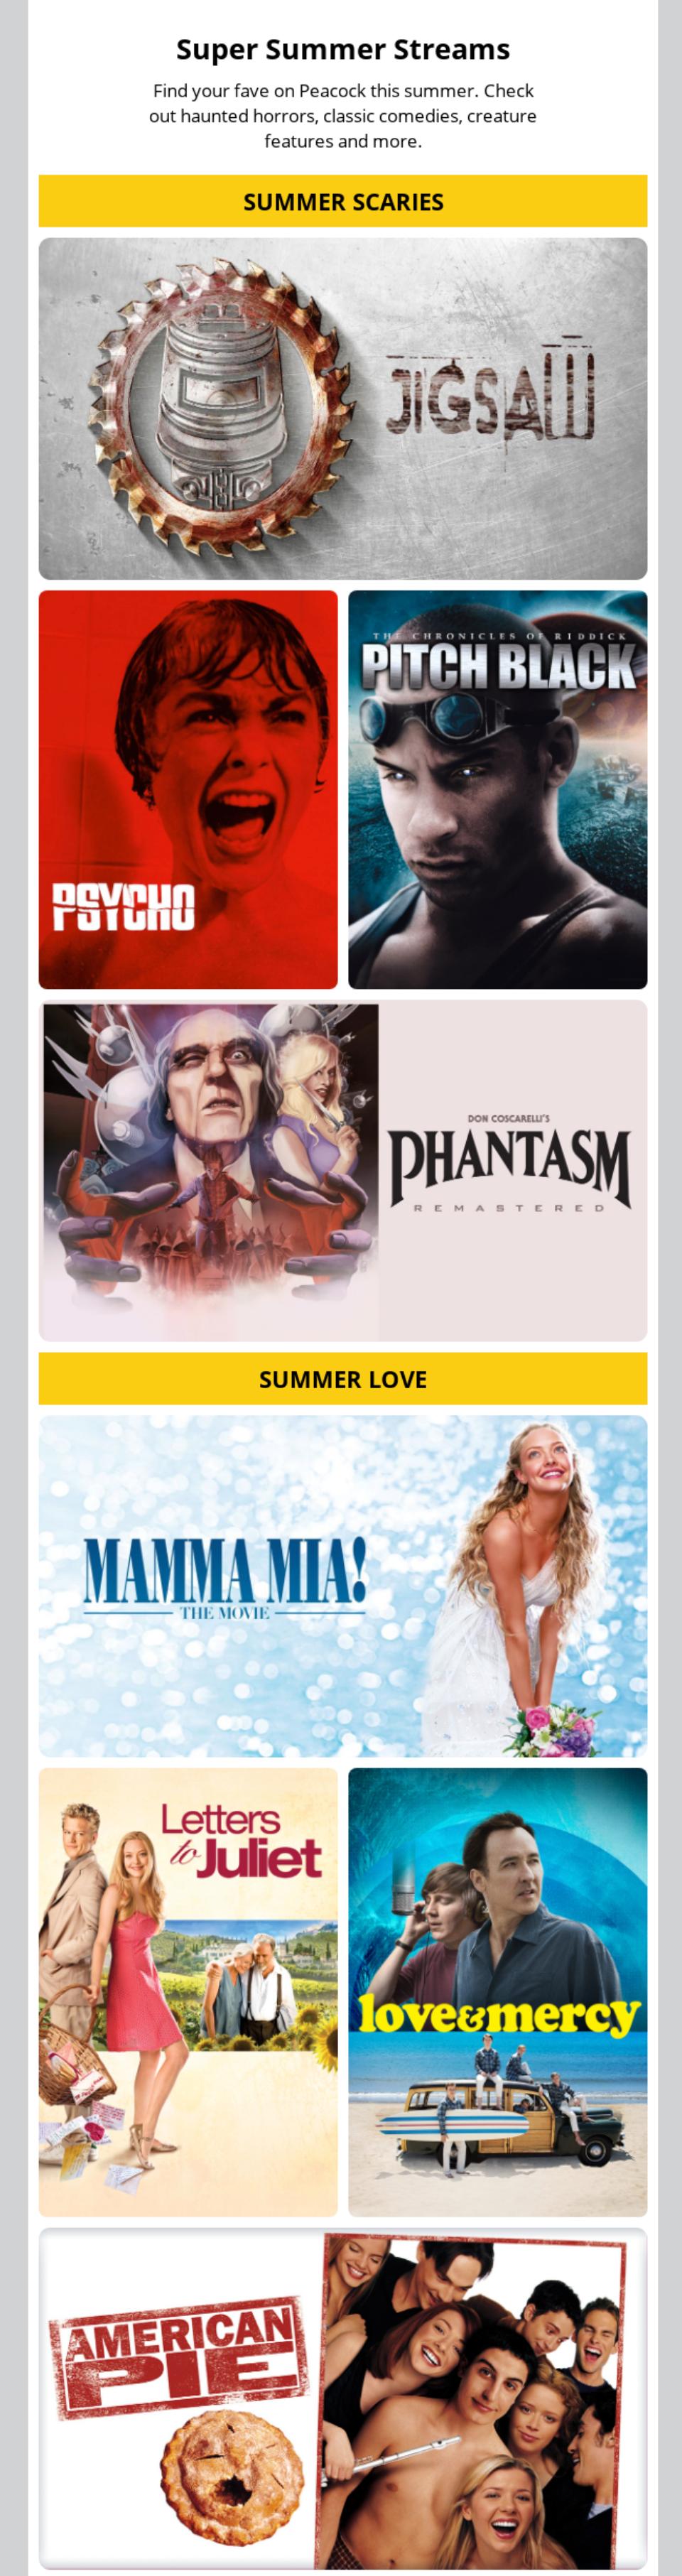 Peacock Nostalgic Movies